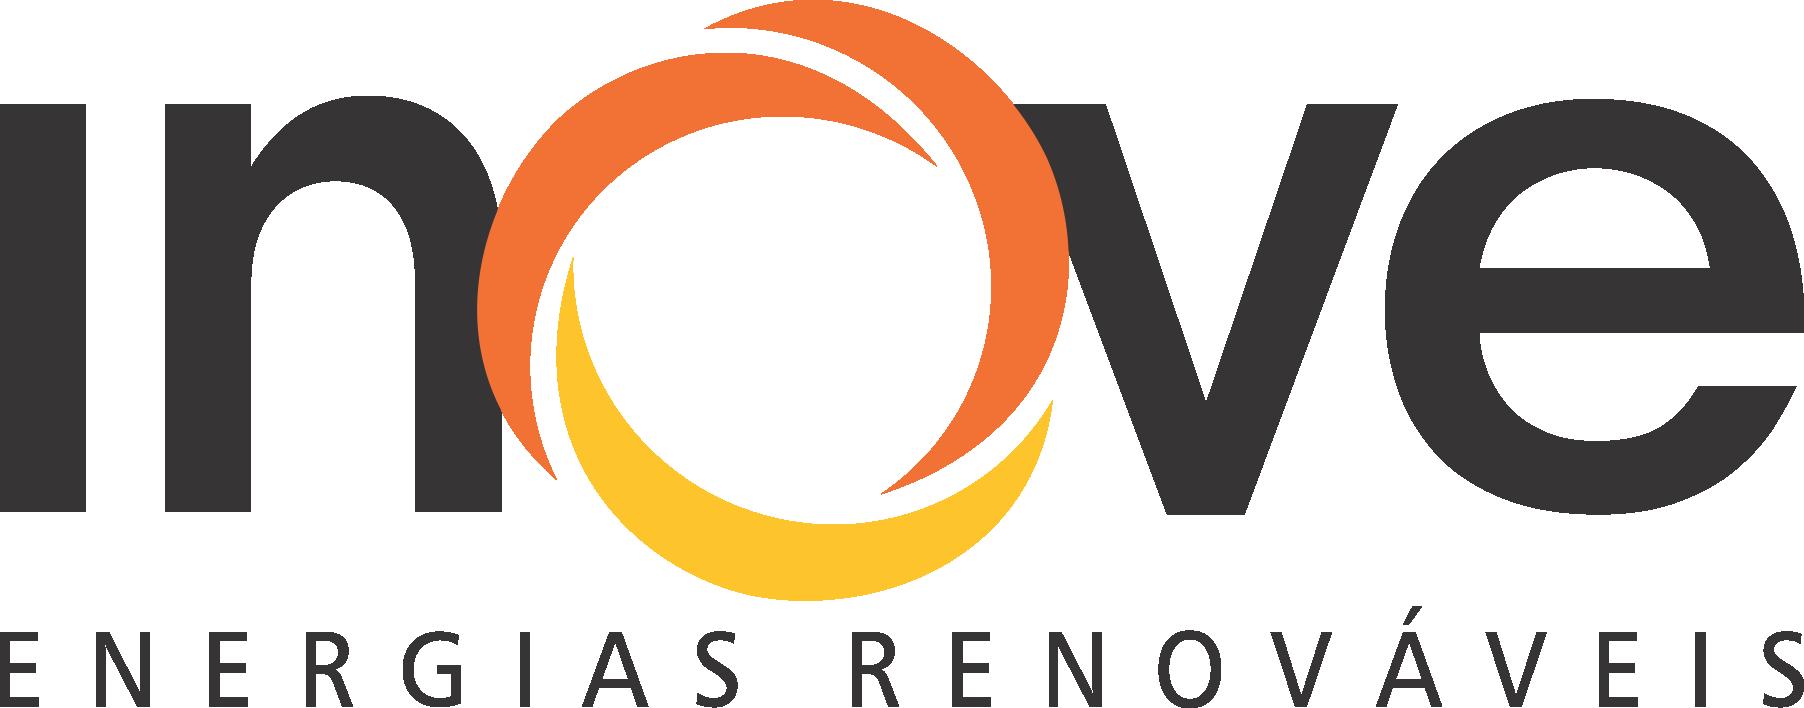 Inove energia renovável logo.png